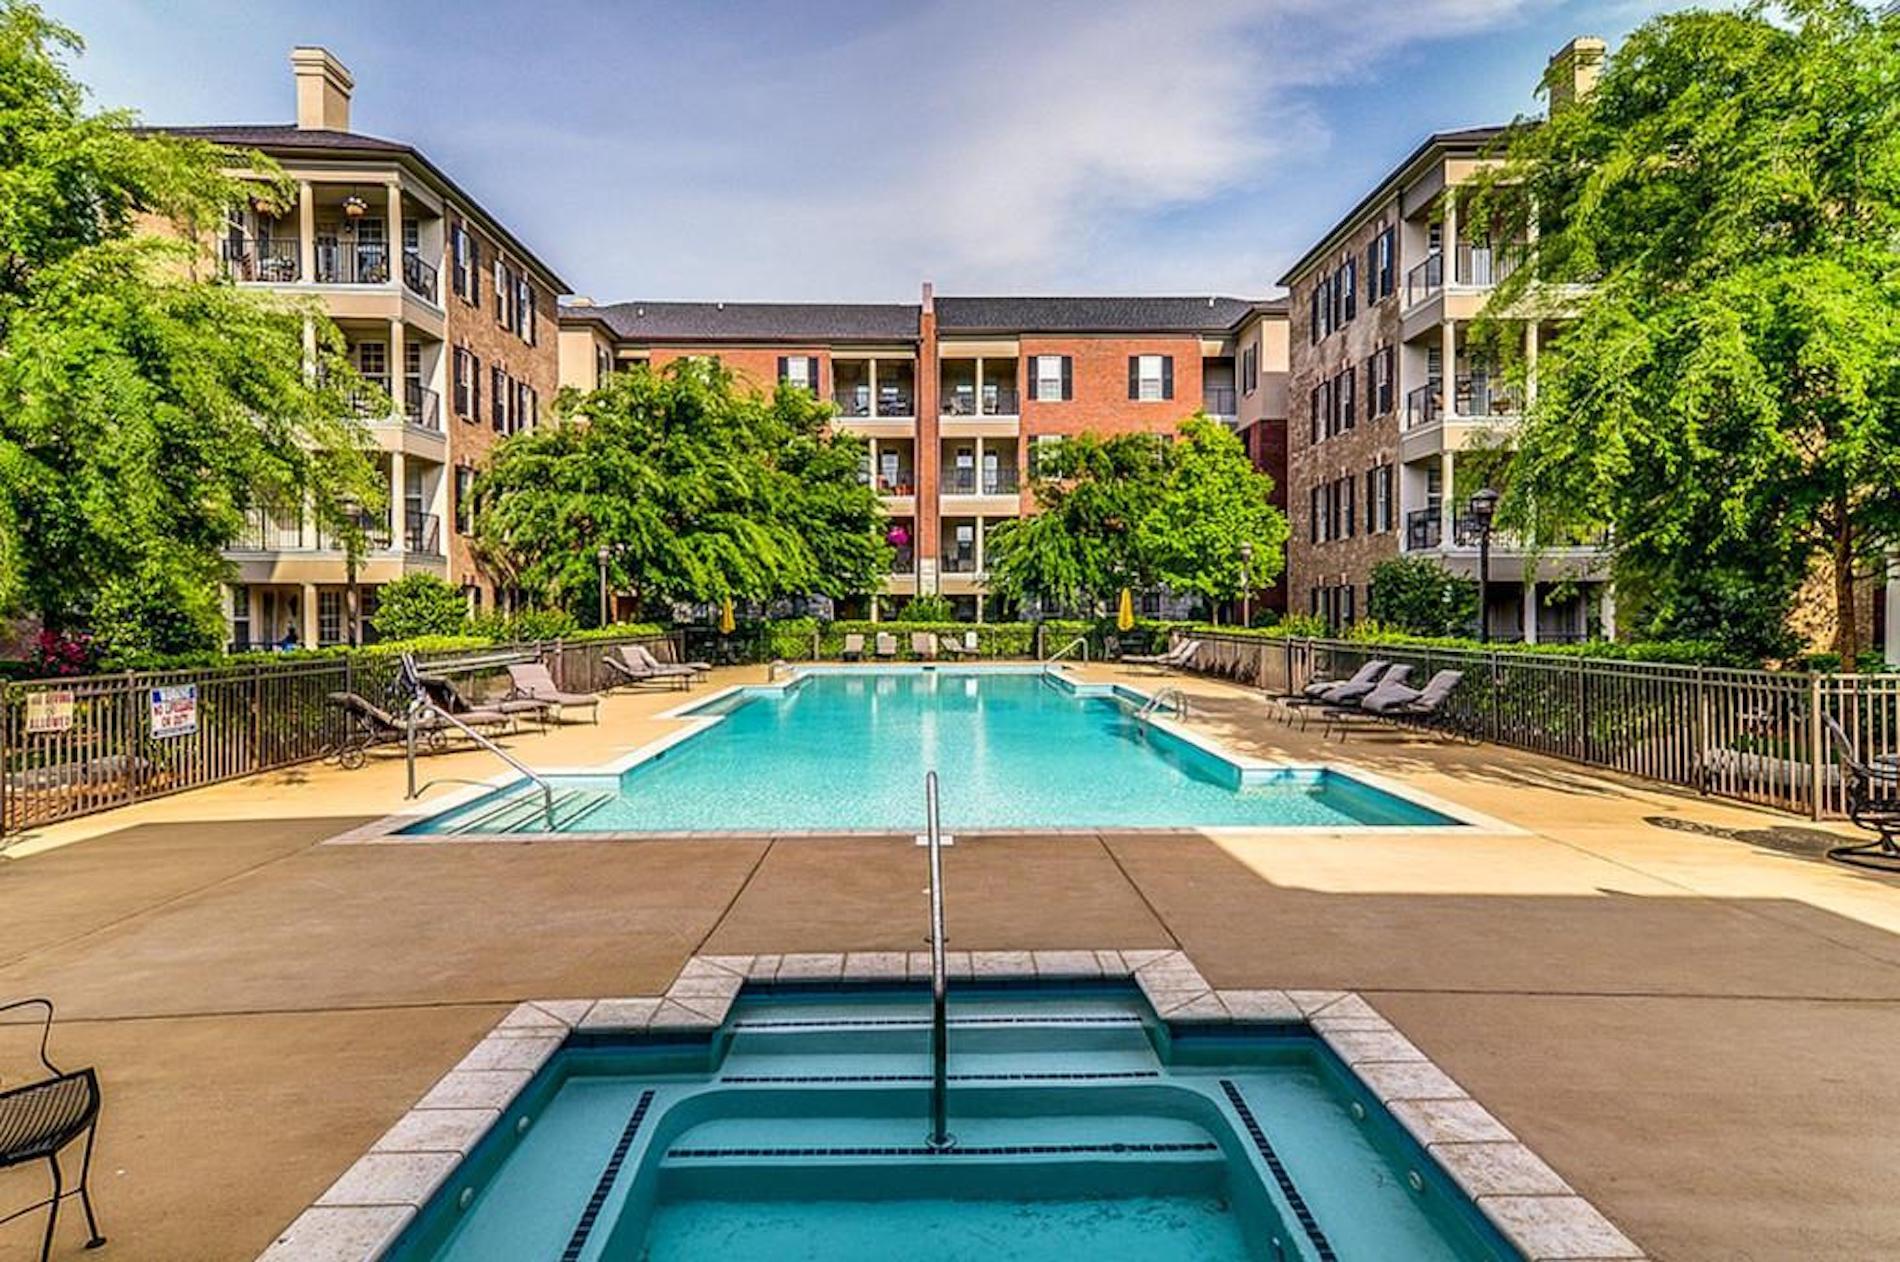 Condo, pool, for sale, Nashville, Brentwood, Franklin, TN